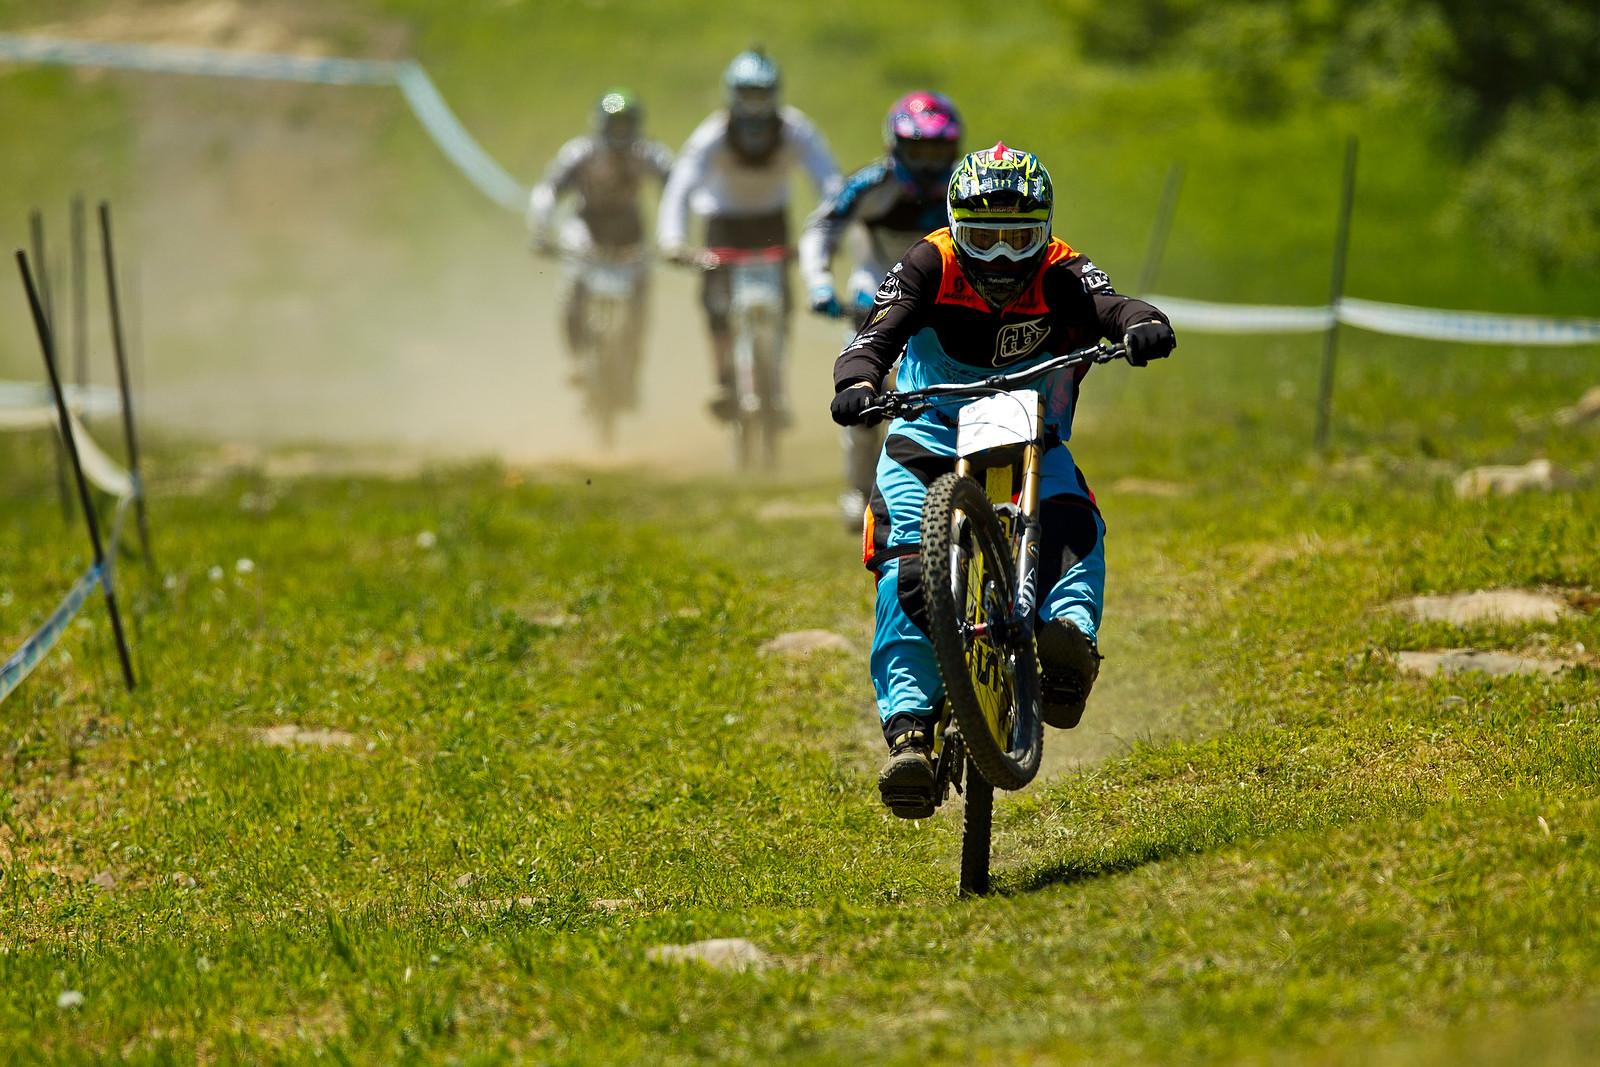 Brendan Fairclough Jamming Everyone Up - 2012 UCI World Cup, Mont Sainte Anne, Day 2 - Mountain Biking Pictures - Vital MTB